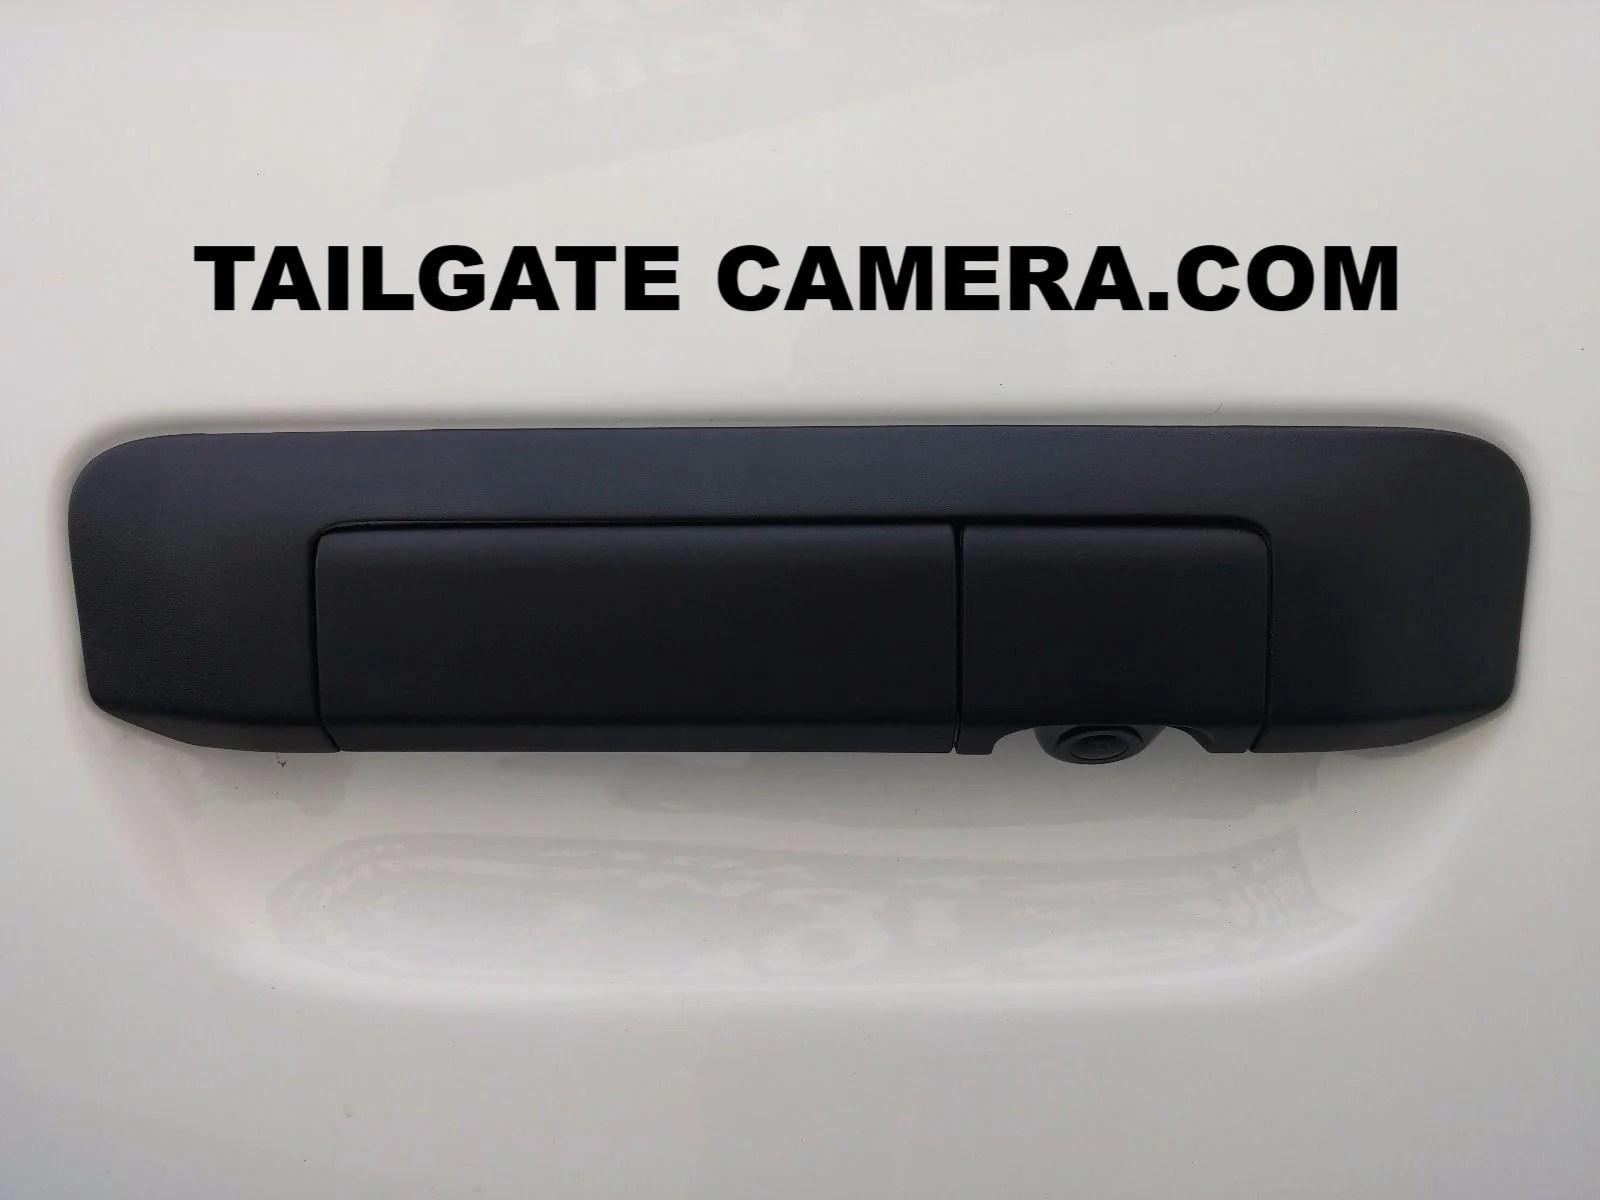 2005-14 Toyota Tacoma Rca Tailgate Handle Backup Camera